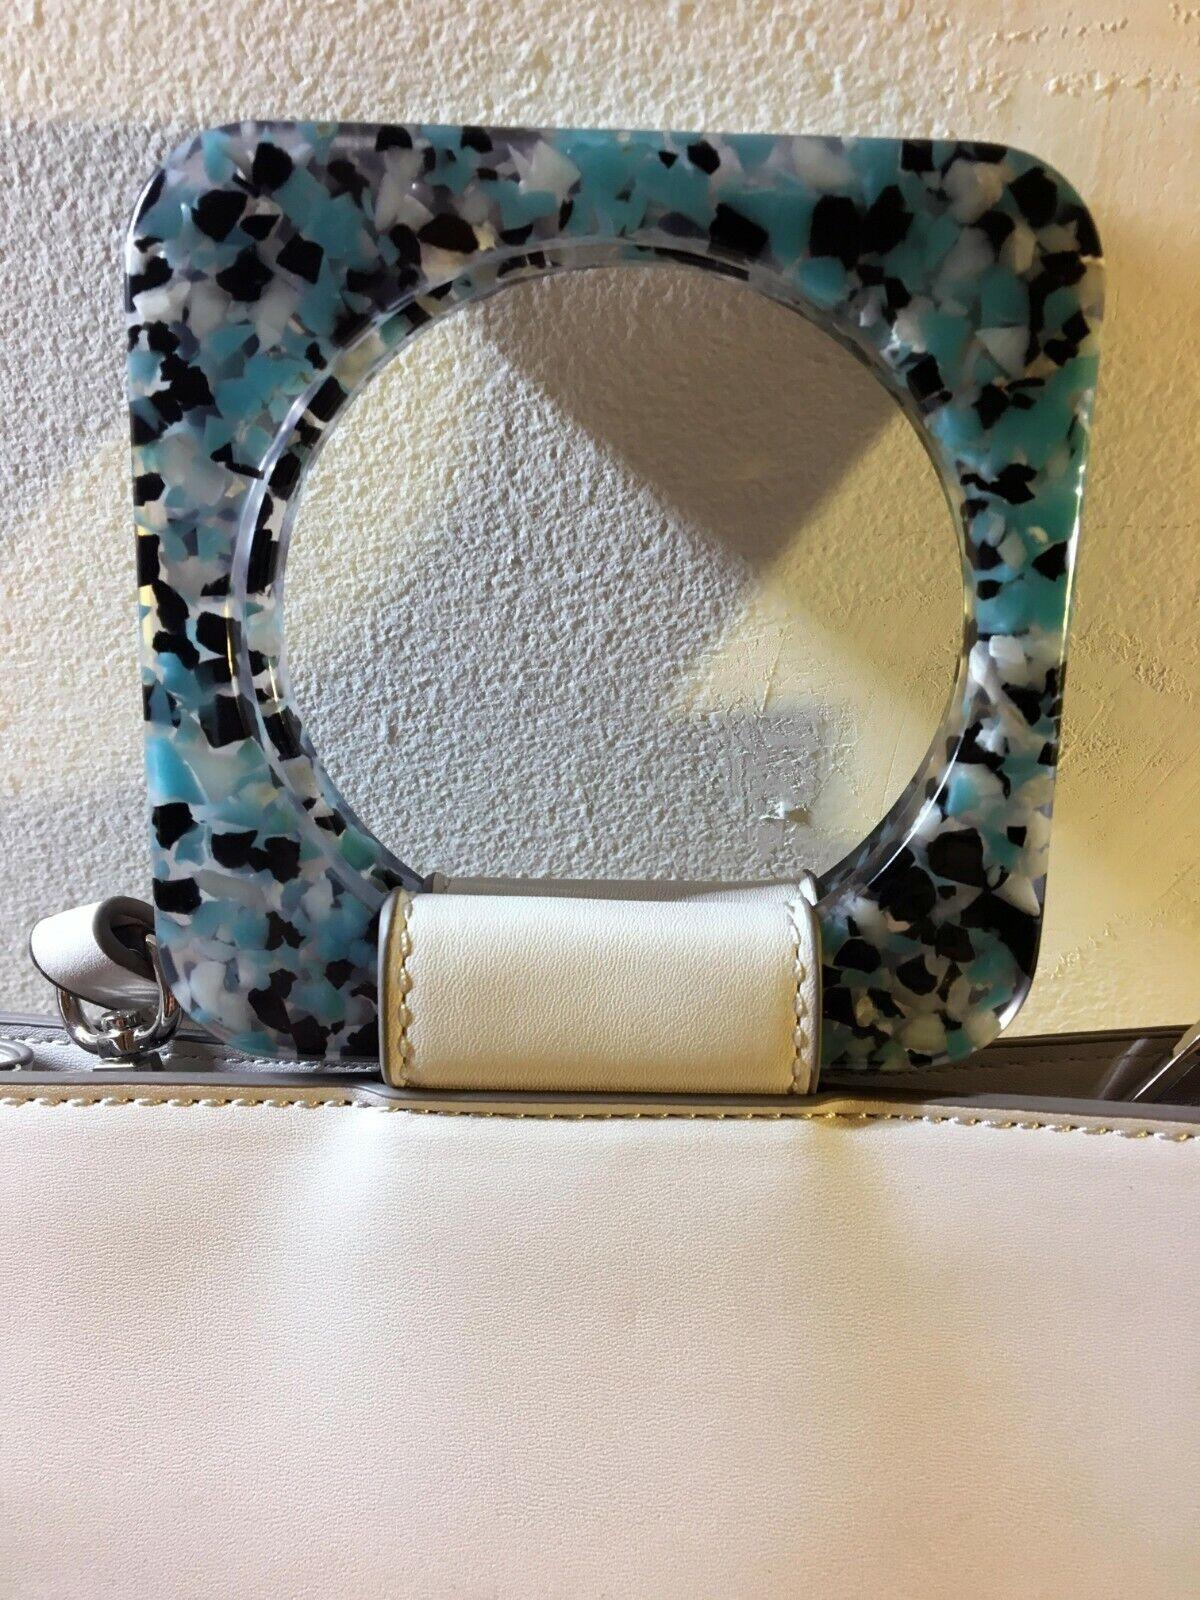 Zara satchel - Light grey with Blue acrylic handles